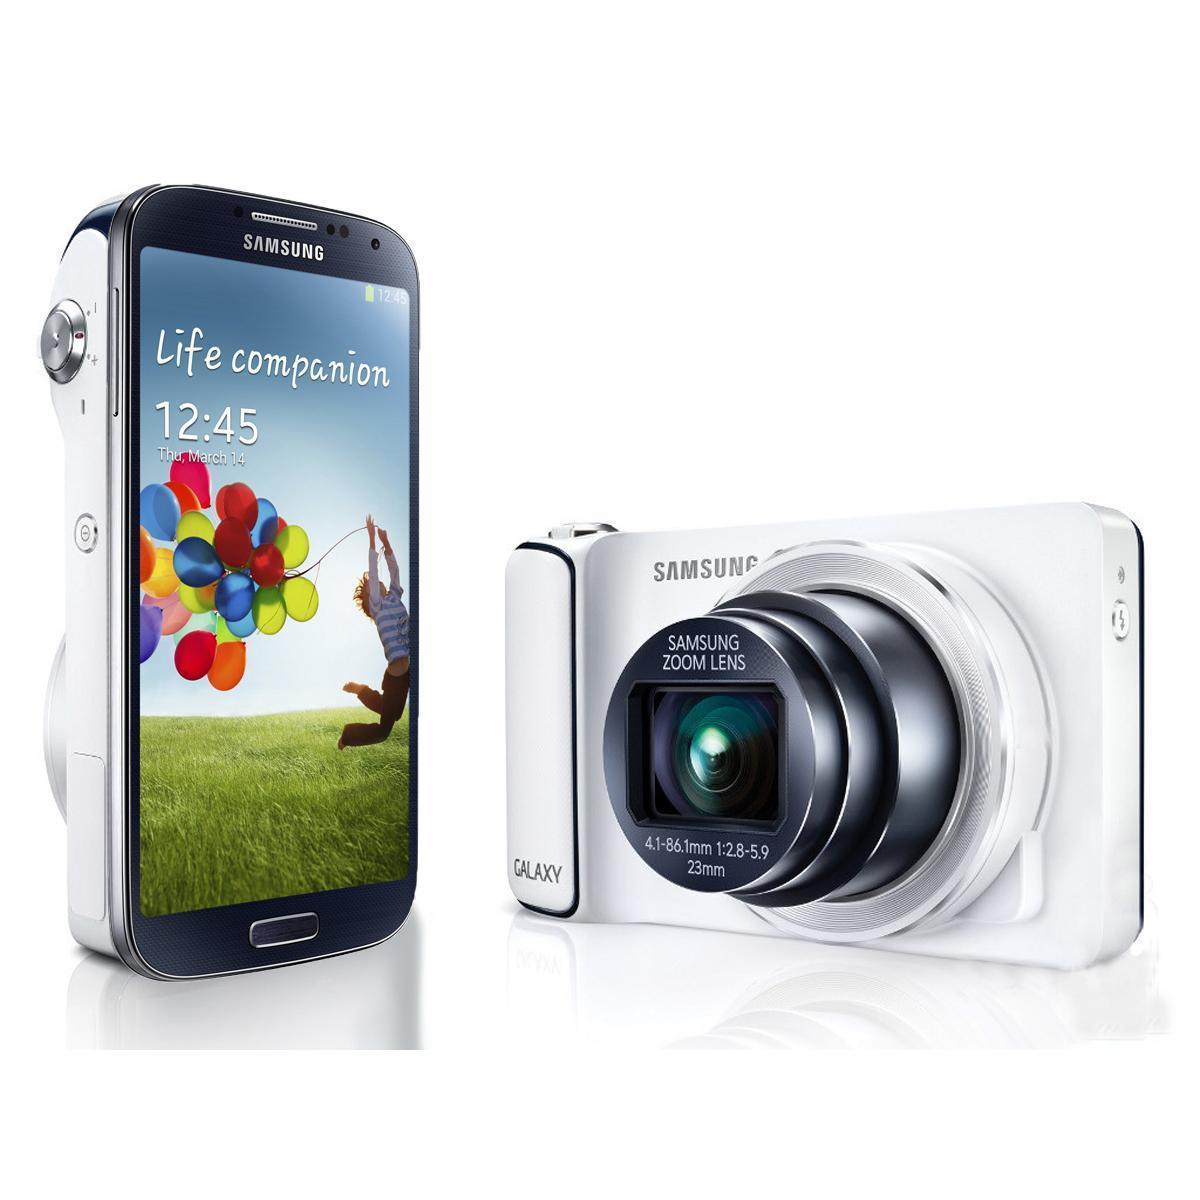 Galaxy S4 Zoom 8 Go - Blanc - Débloqué